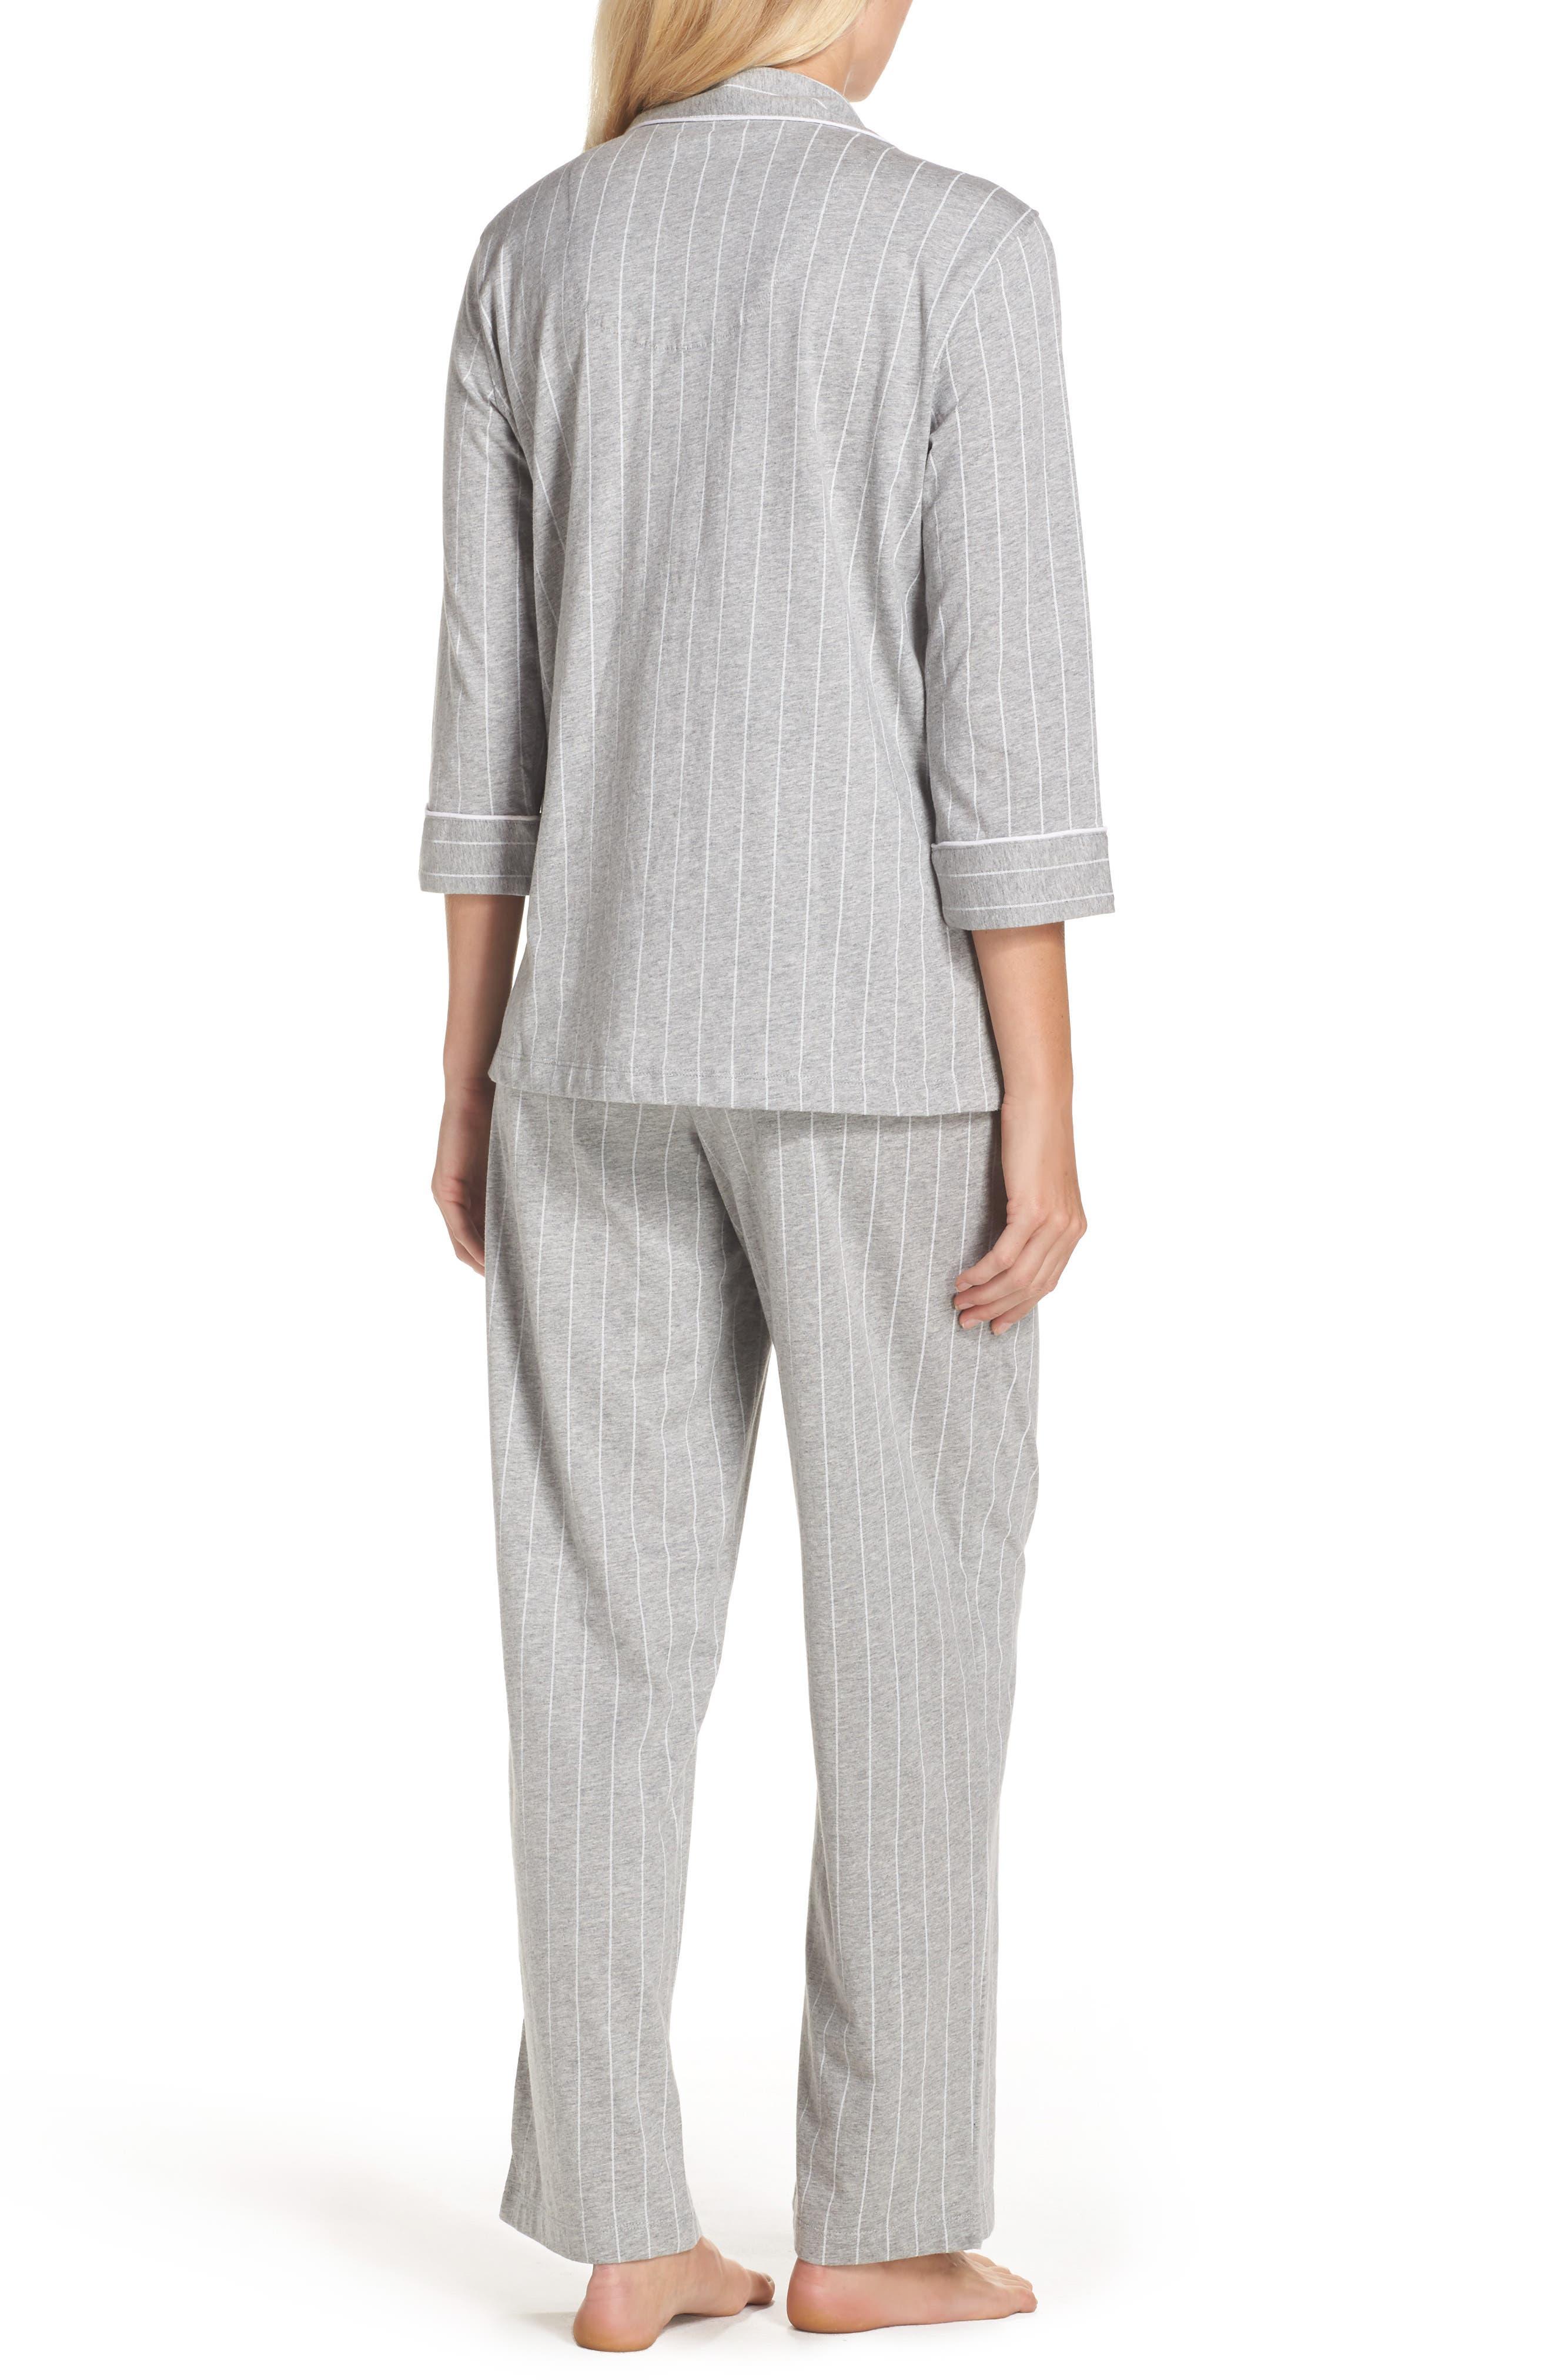 Notch Collar Pajamas,                             Alternate thumbnail 2, color,                             025